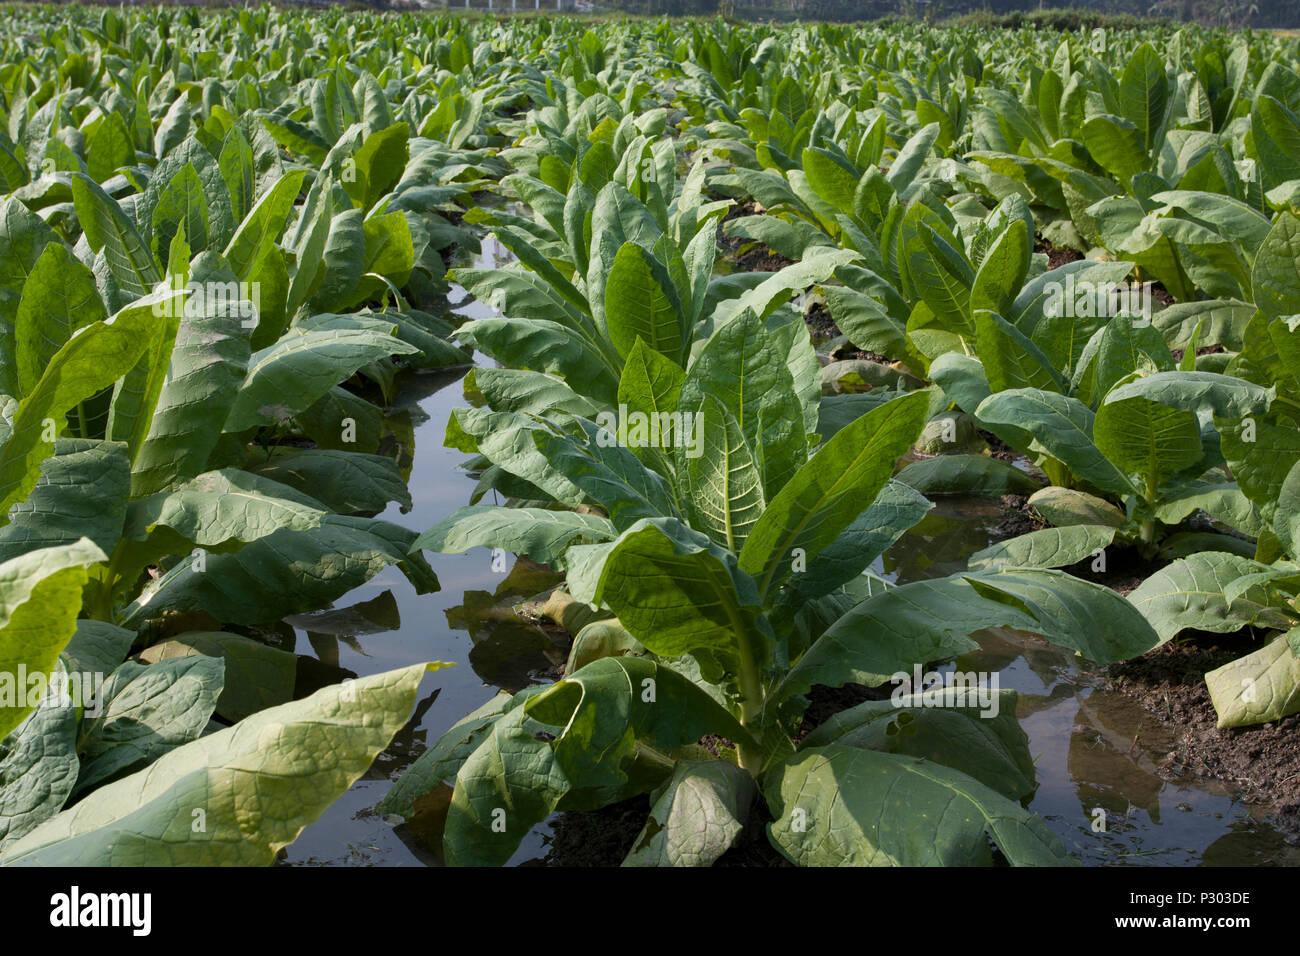 Tobacco plantation in Manikganj. Bangladesh. - Stock Image